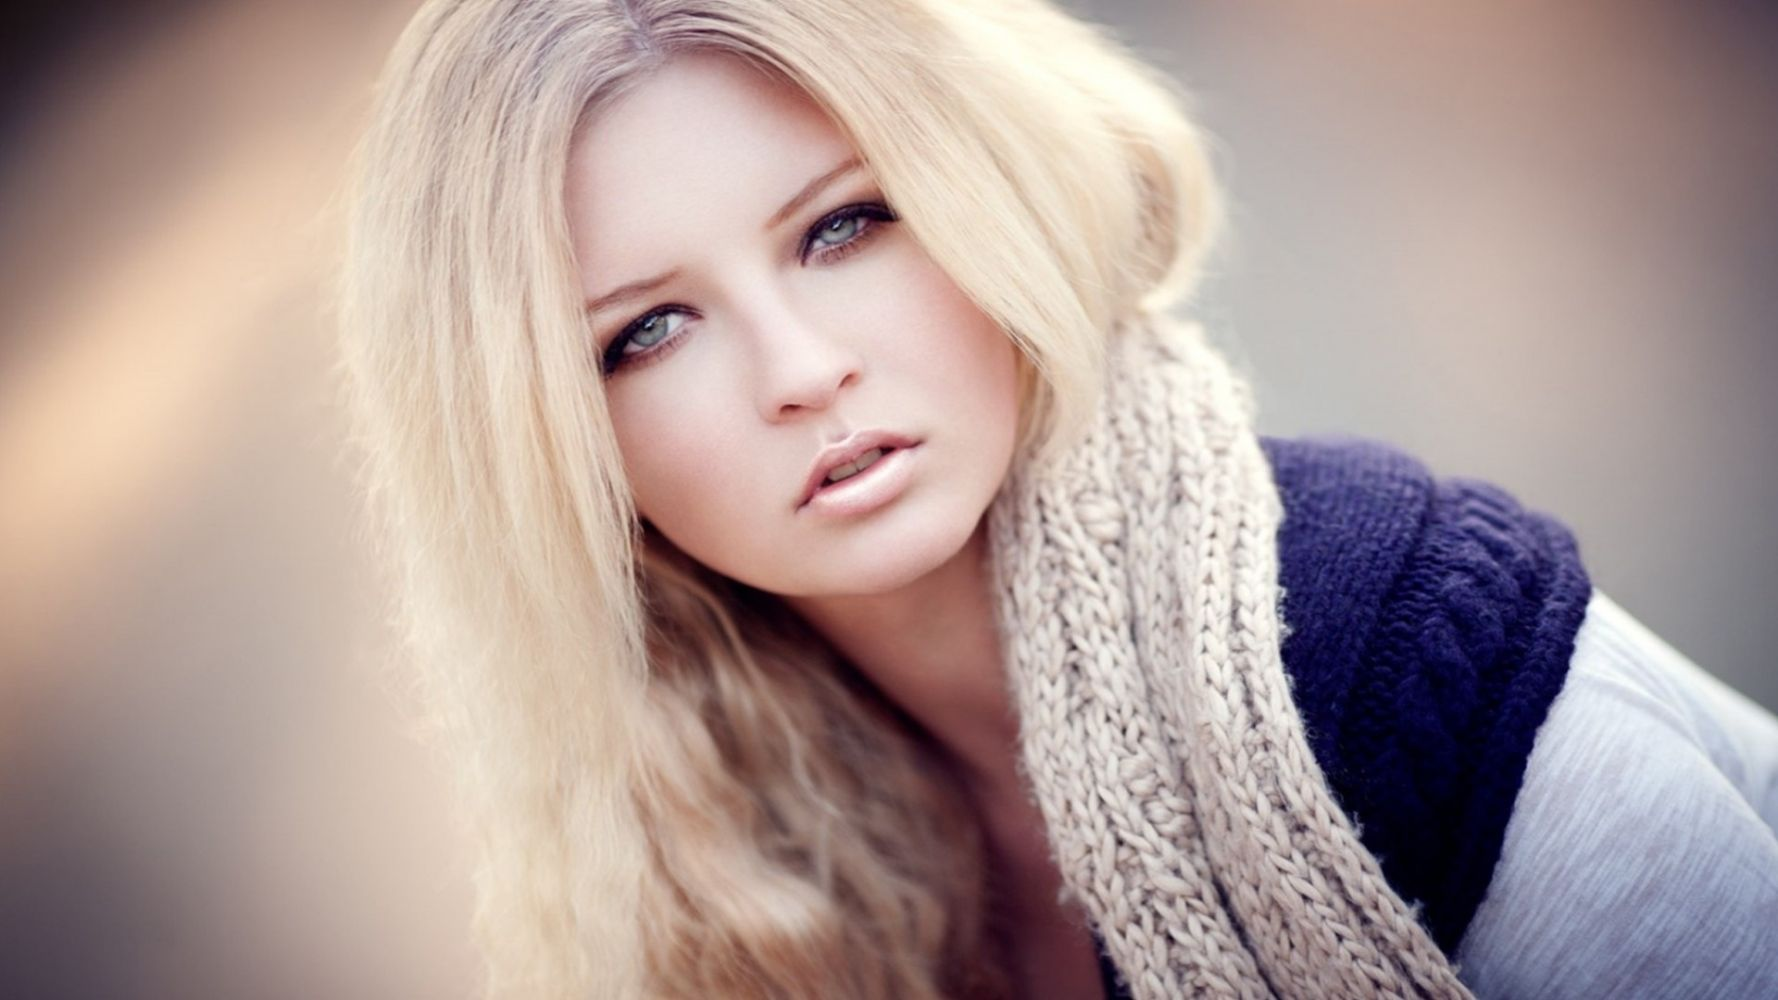 blond-girl-year-naked-teen-girls-baking